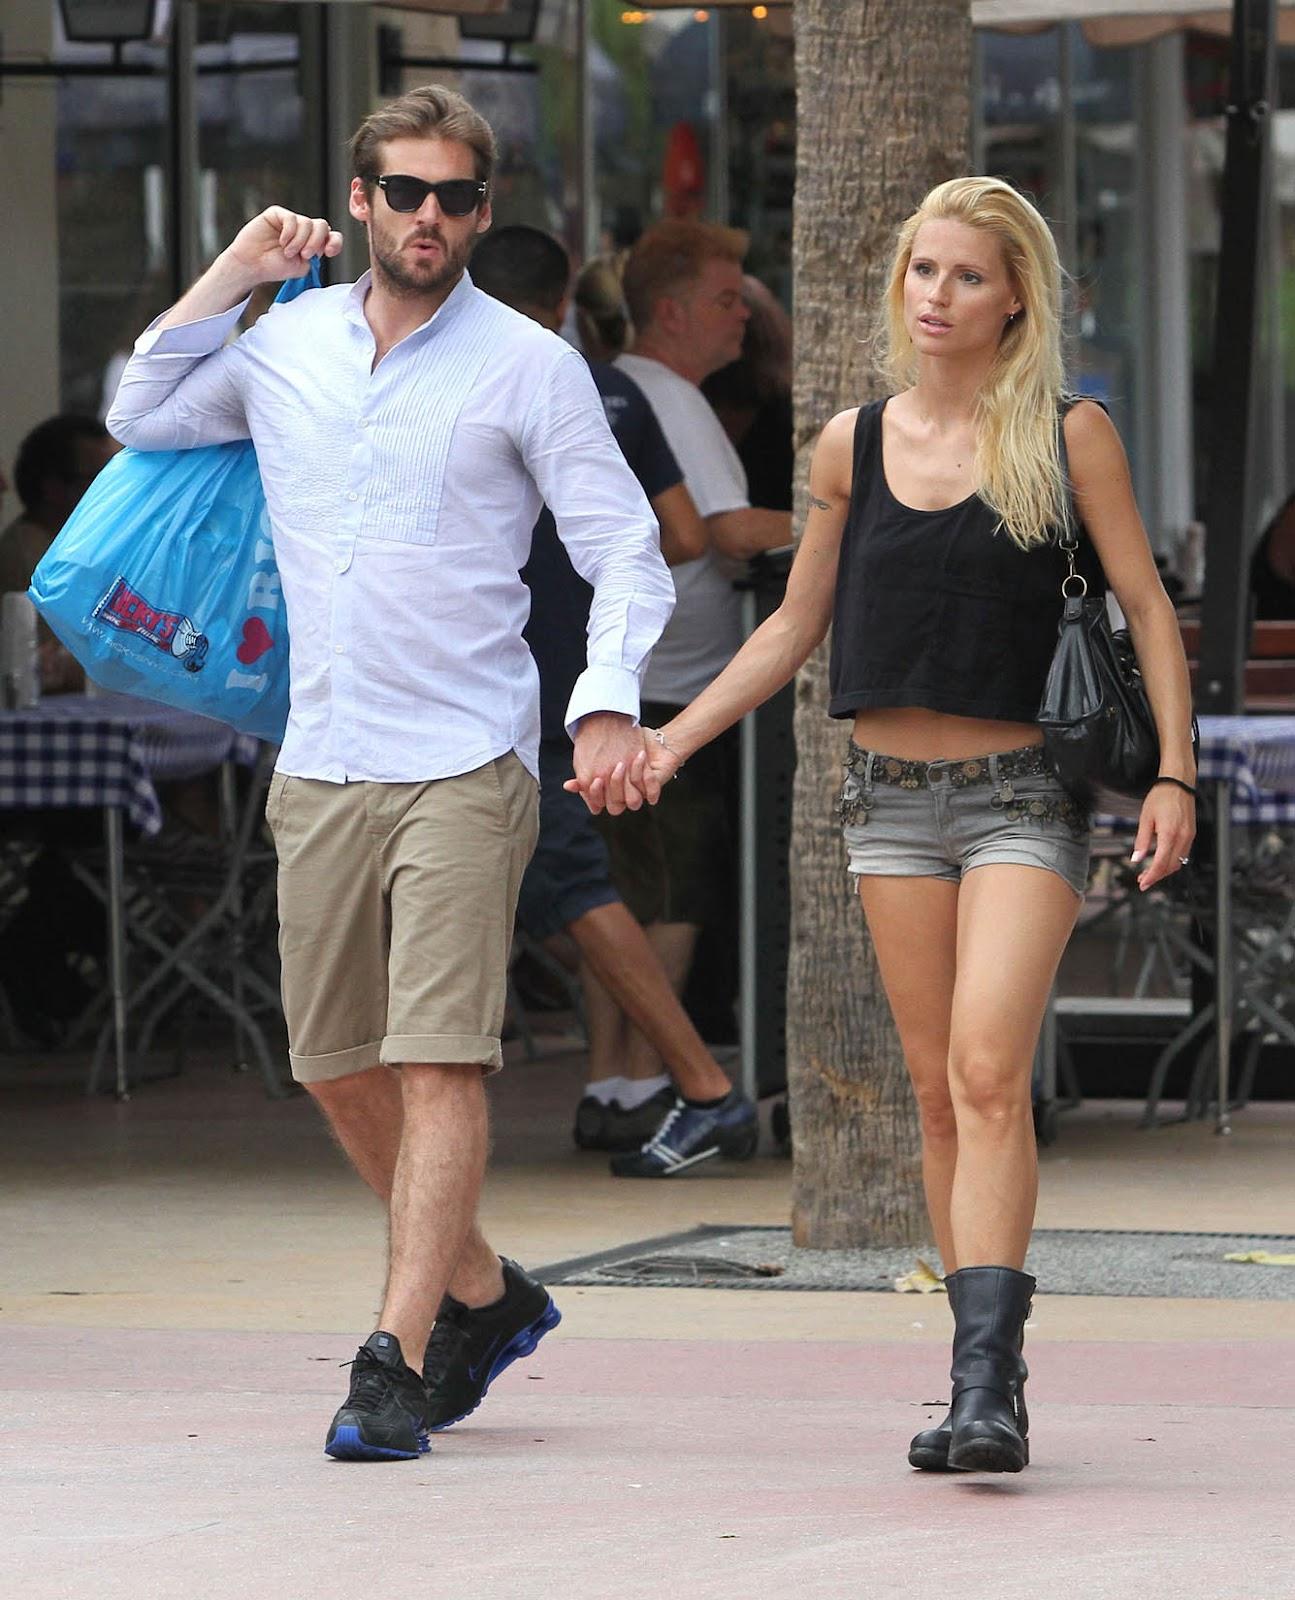 http://2.bp.blogspot.com/-C13NMjdRCDo/T9CTjip__QI/AAAAAAAAKdI/h7MNLA-KAtE/s1600/michelle_hunziker_jean_shorts_6.jpg